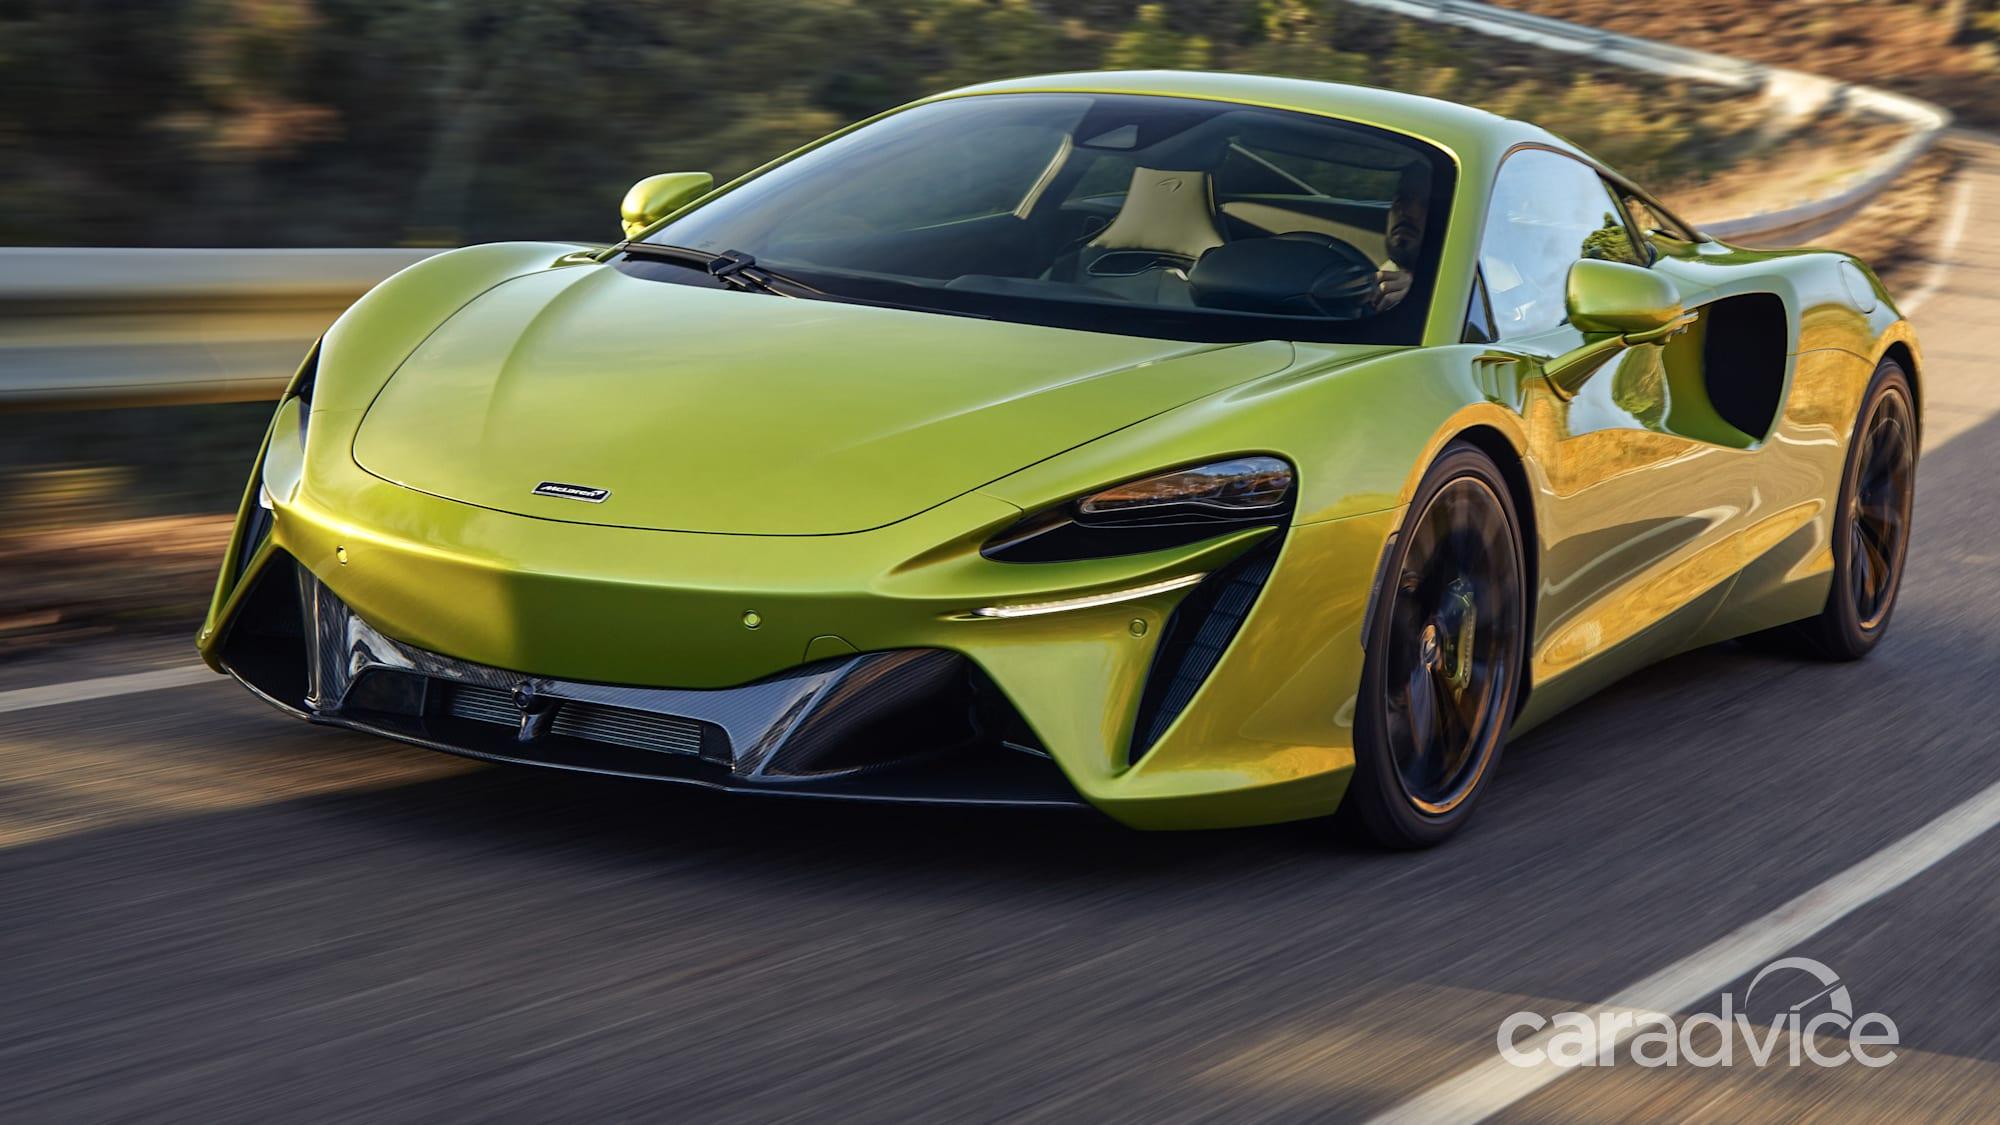 2021 mclaren artura unveiled: hybrid v6 joins supercar